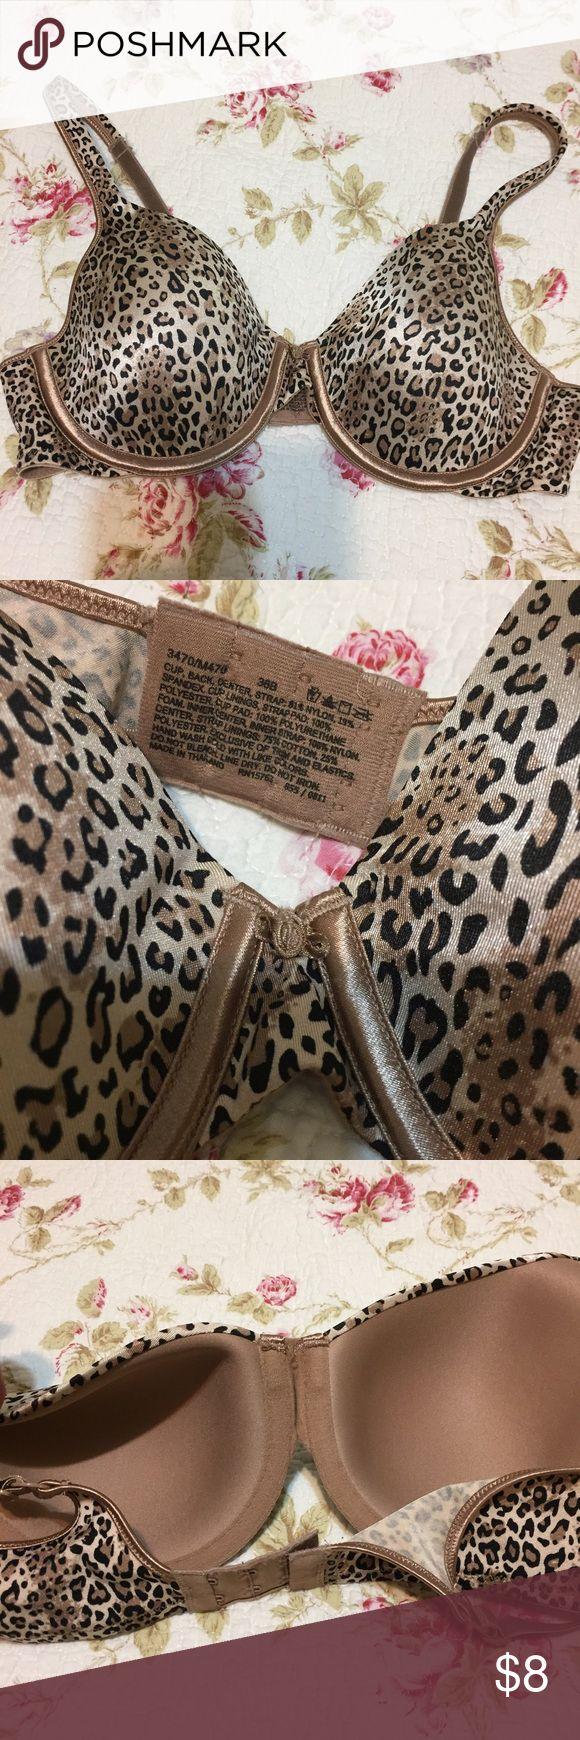 NWOT maiden form cheetah print 36b NWOT sexy soft cheetah bra 36b non smoking home 👠💋💅🏻 Maidenform Intimates & Sleepwear Bras